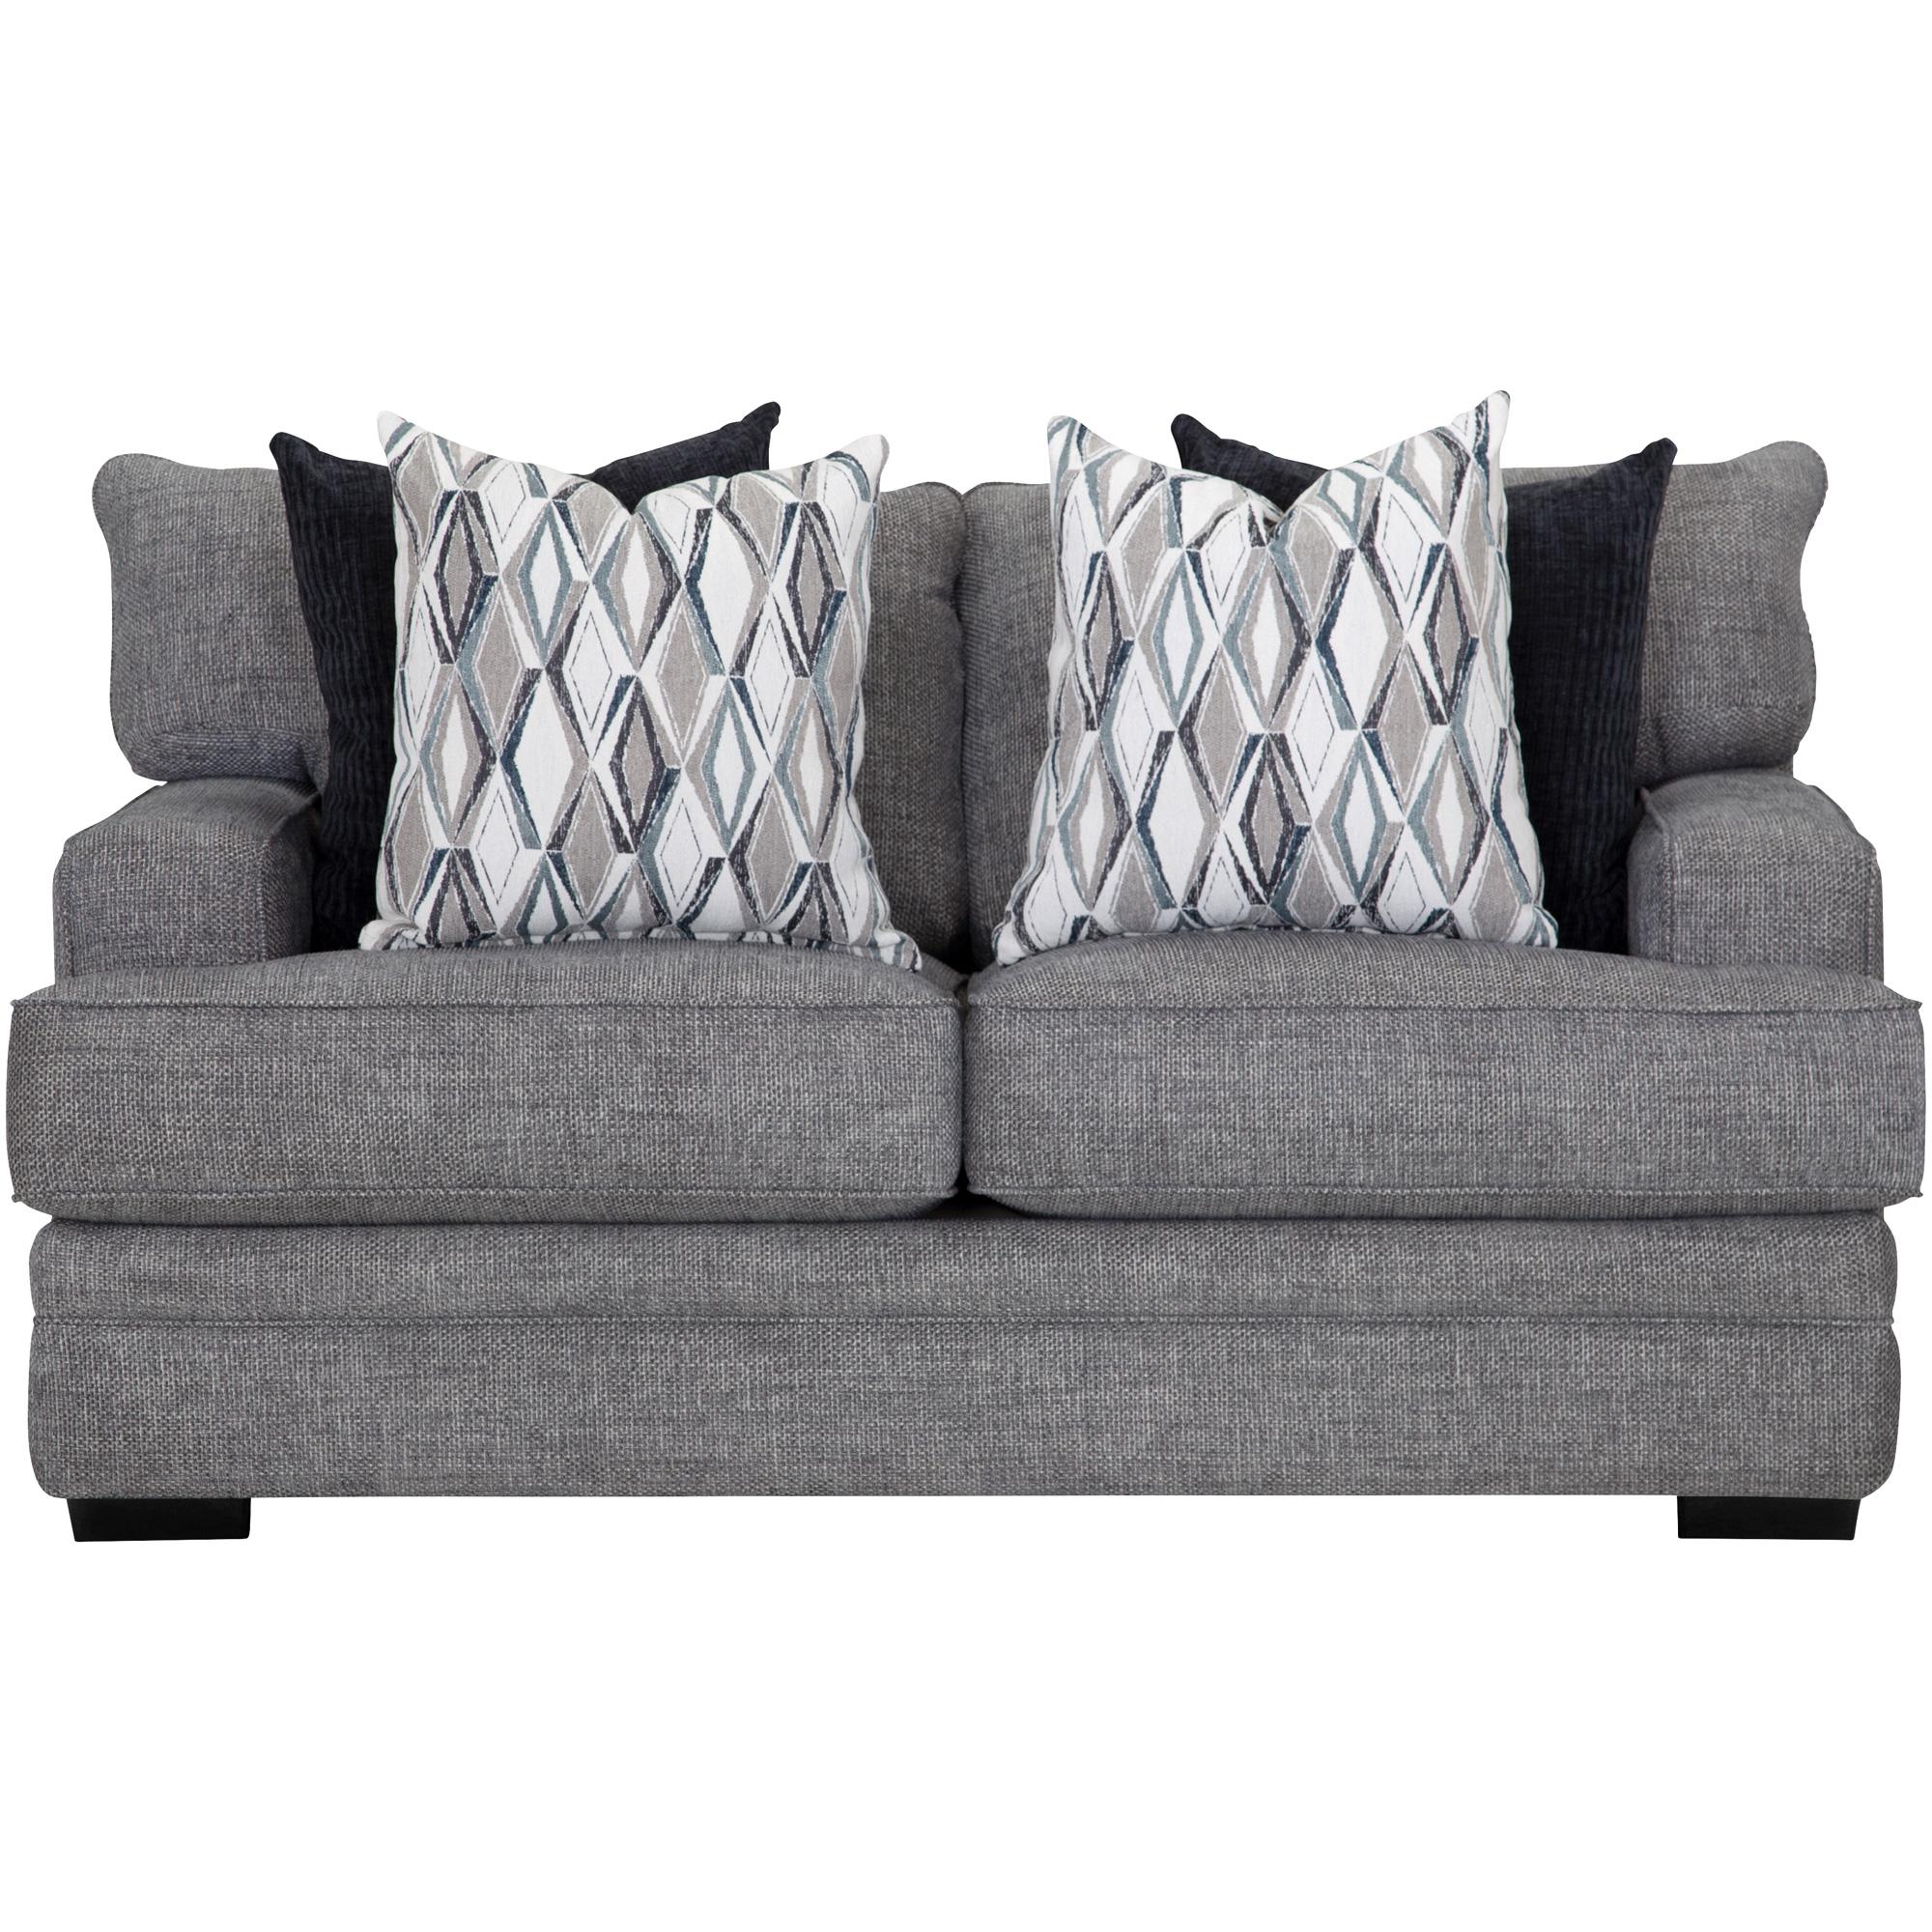 Must Have Franklin Crowes Denim Loveseat Sofa From Franklin Ibt Shop